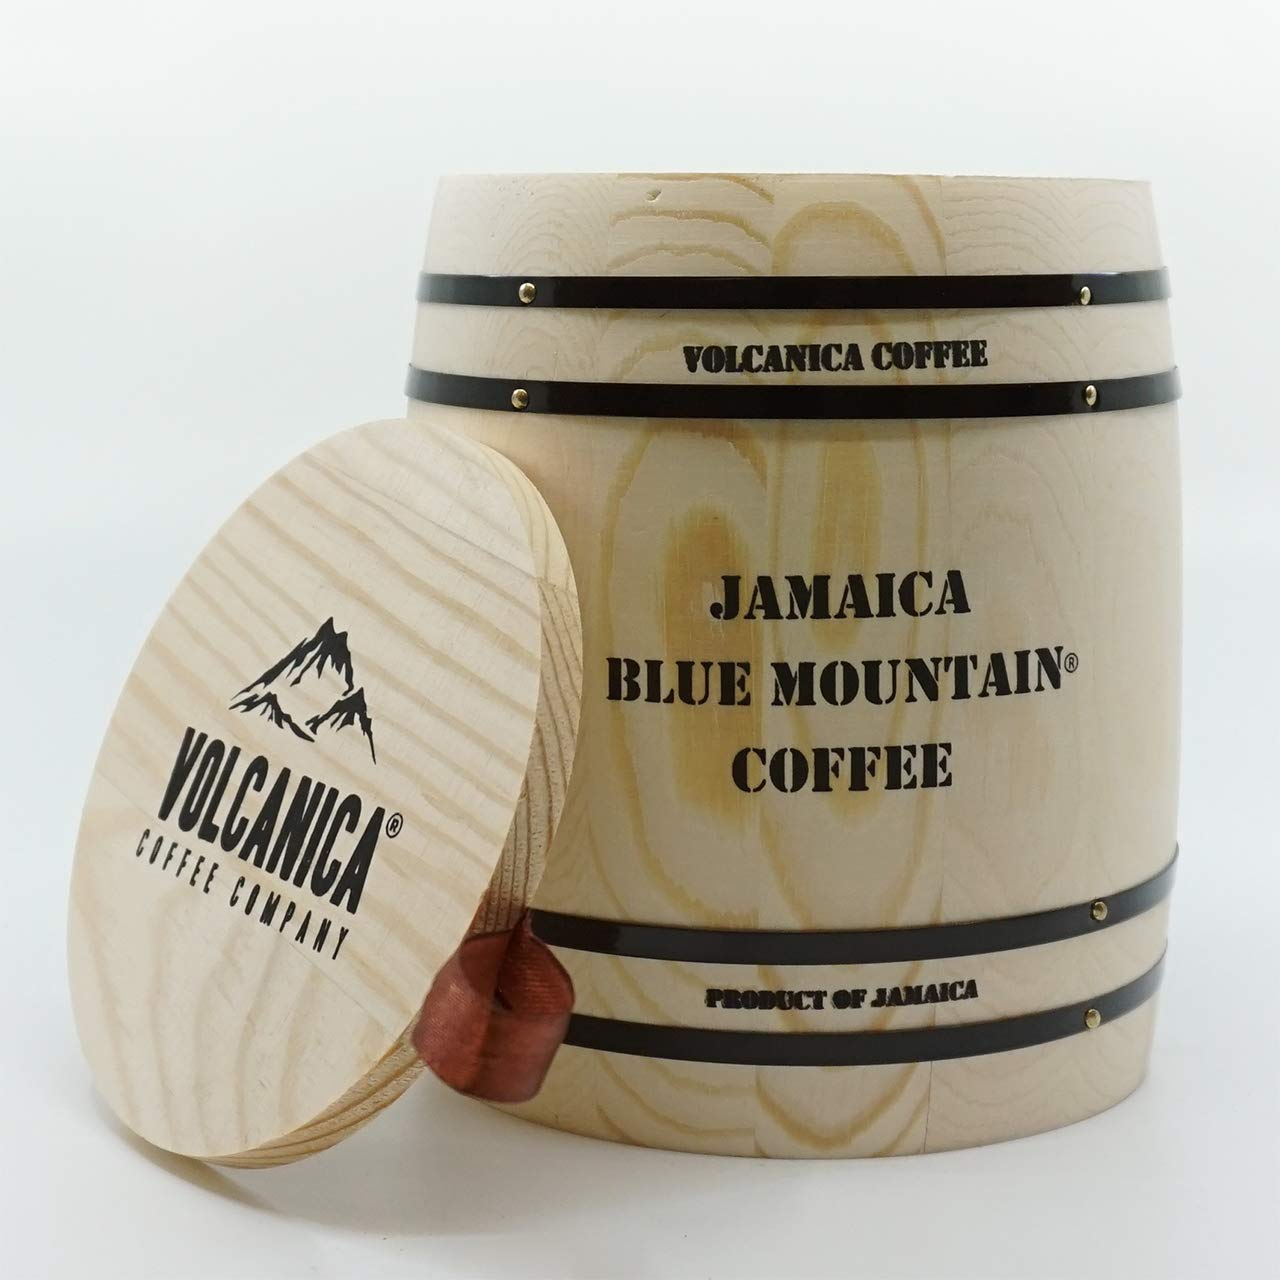 Jamaican Blue Mountain Coffee Gift Box Barrel, 100% Certified, Whole Bean, Fresh Roasted, Souvenir Gift Barrel, 8-ounce